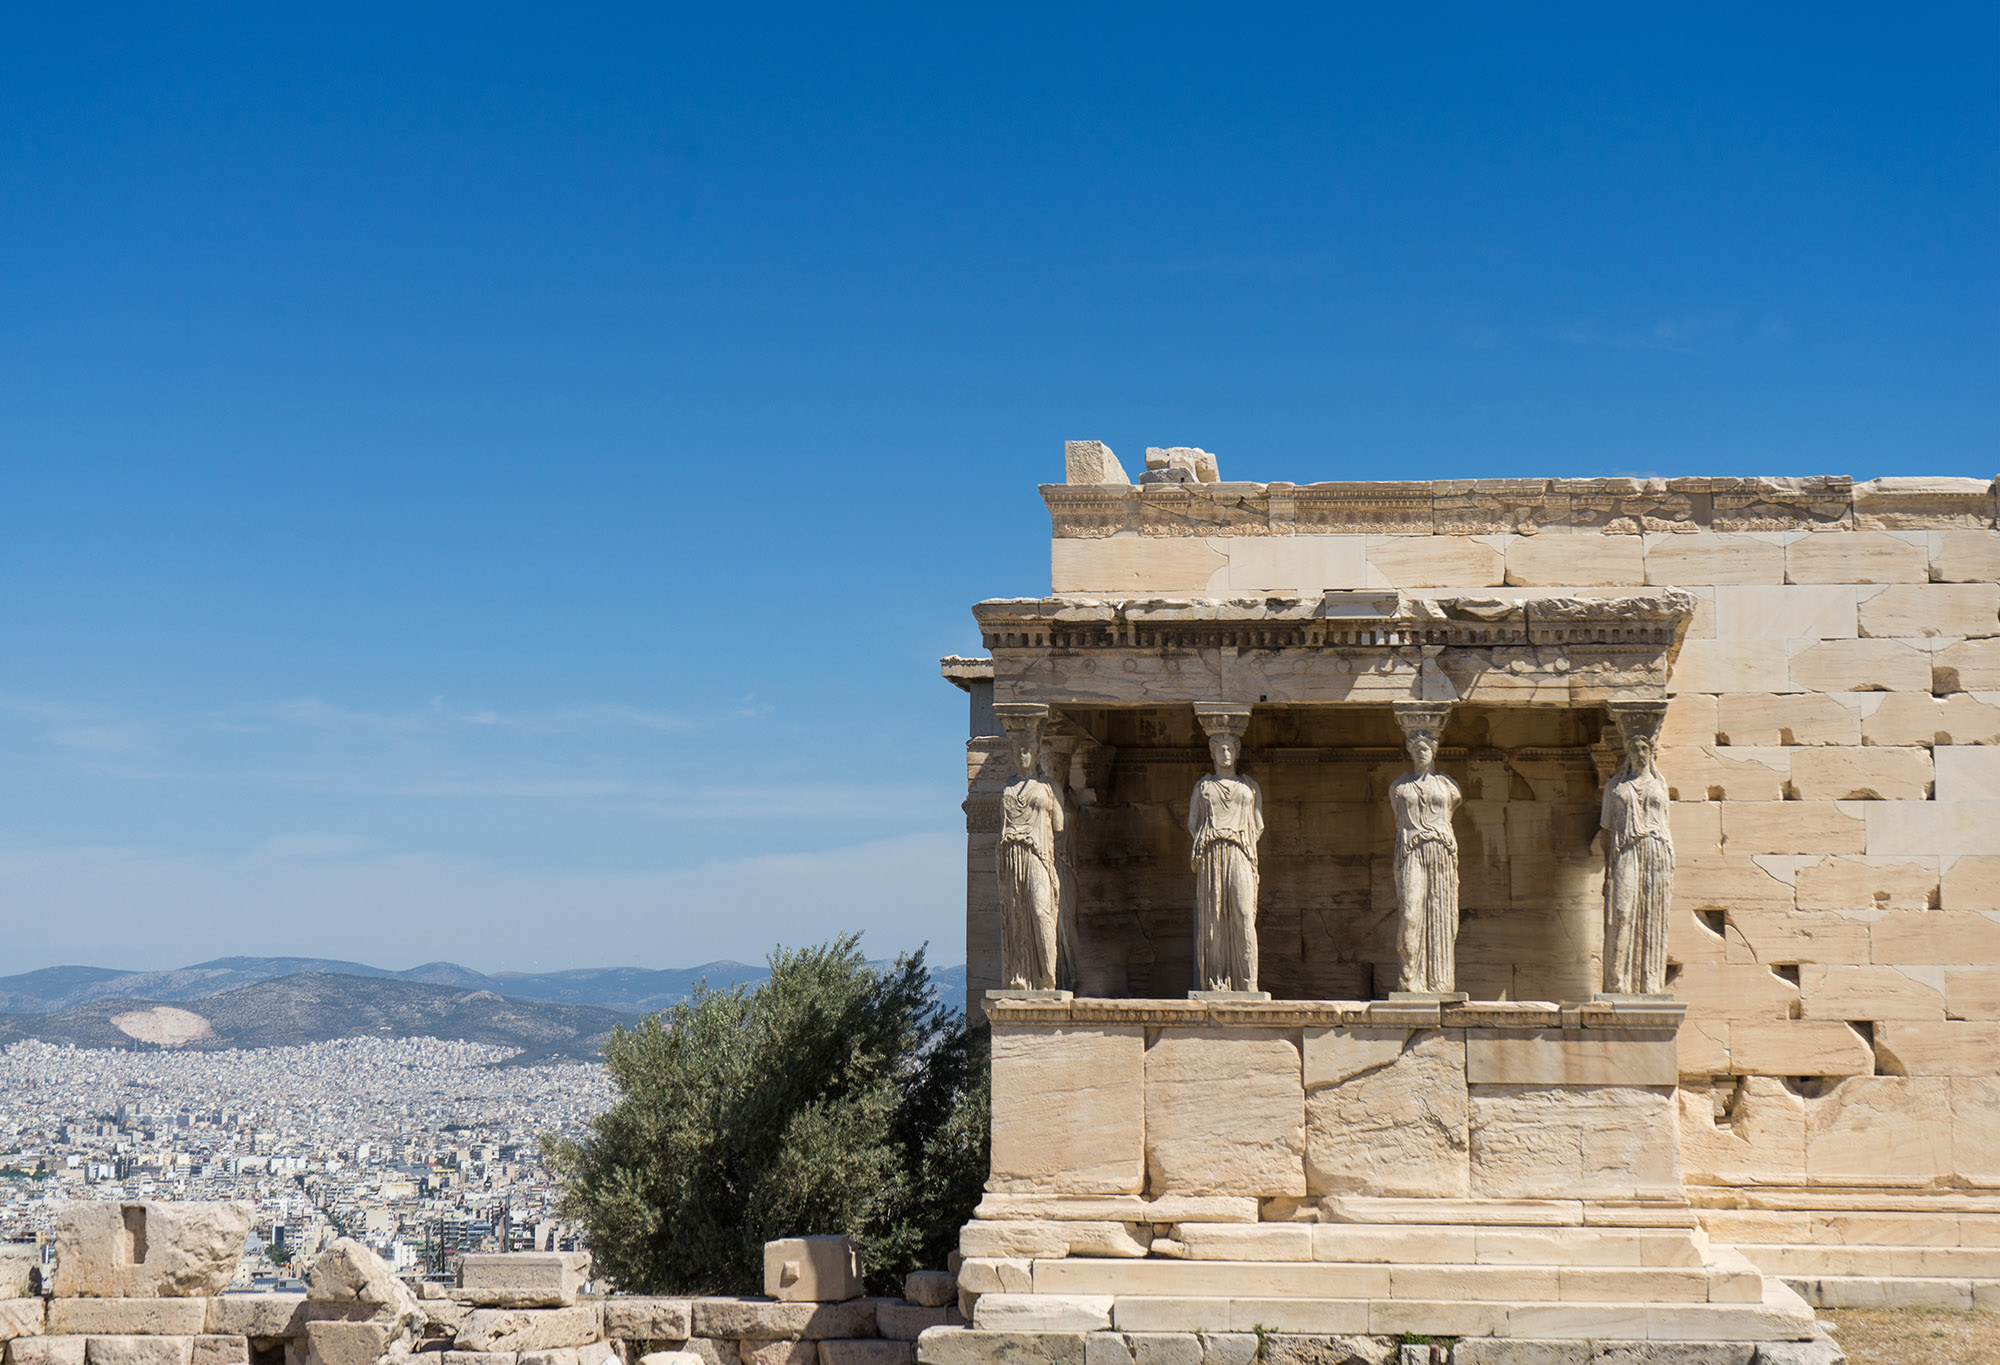 EDIT_caryatides-erechtheion-temple-acropolis-in-athens-PGYRQAR.jpg